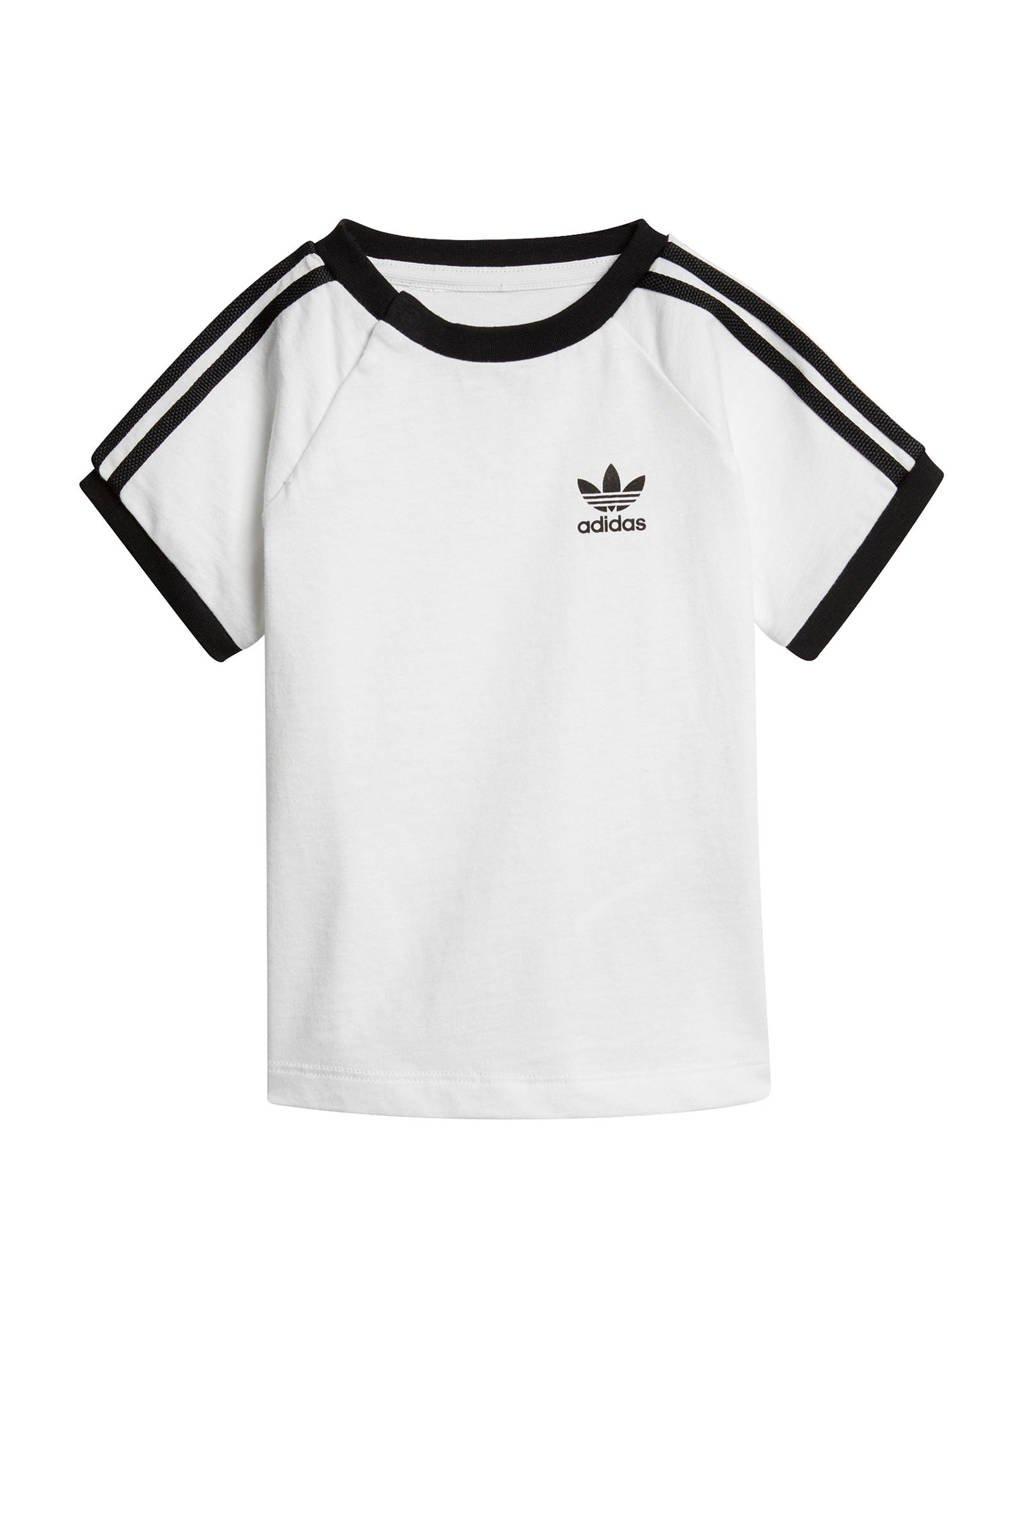 adidas originals T-shirt wit, Wit/zwart